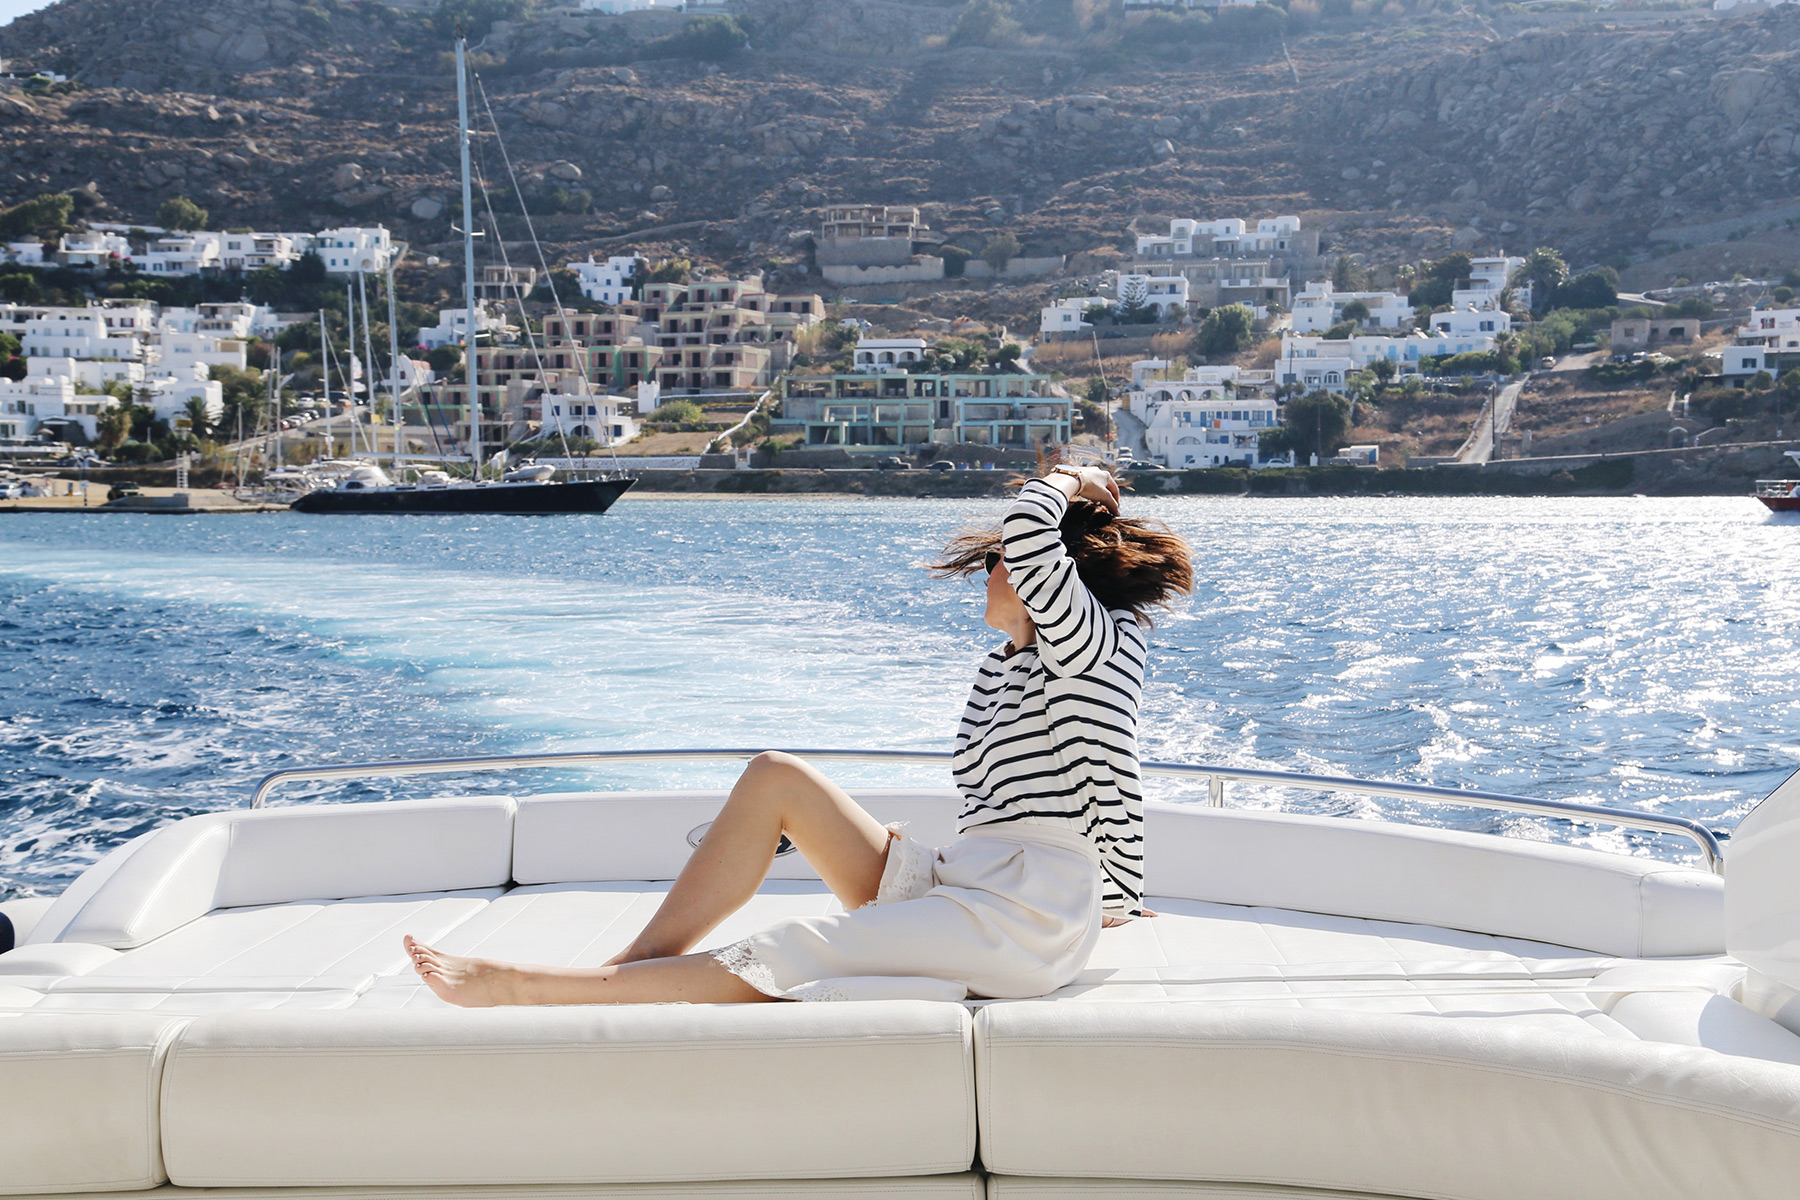 nautical chic style